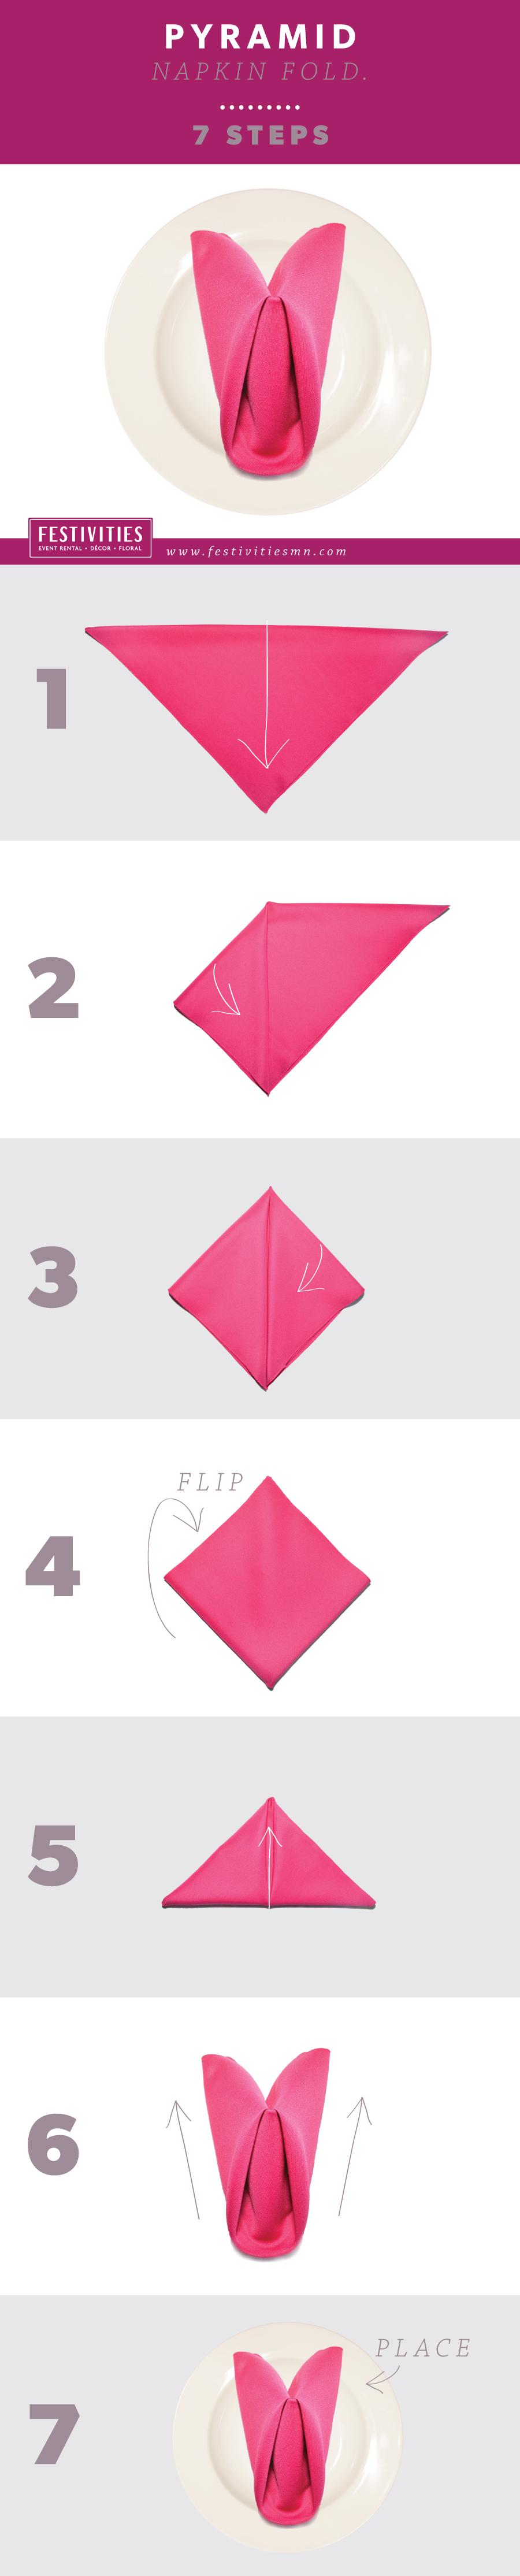 Napkin folding instructions for the pyramid napkin fold - How To Pyramid Napkin Fold In 7 Steps